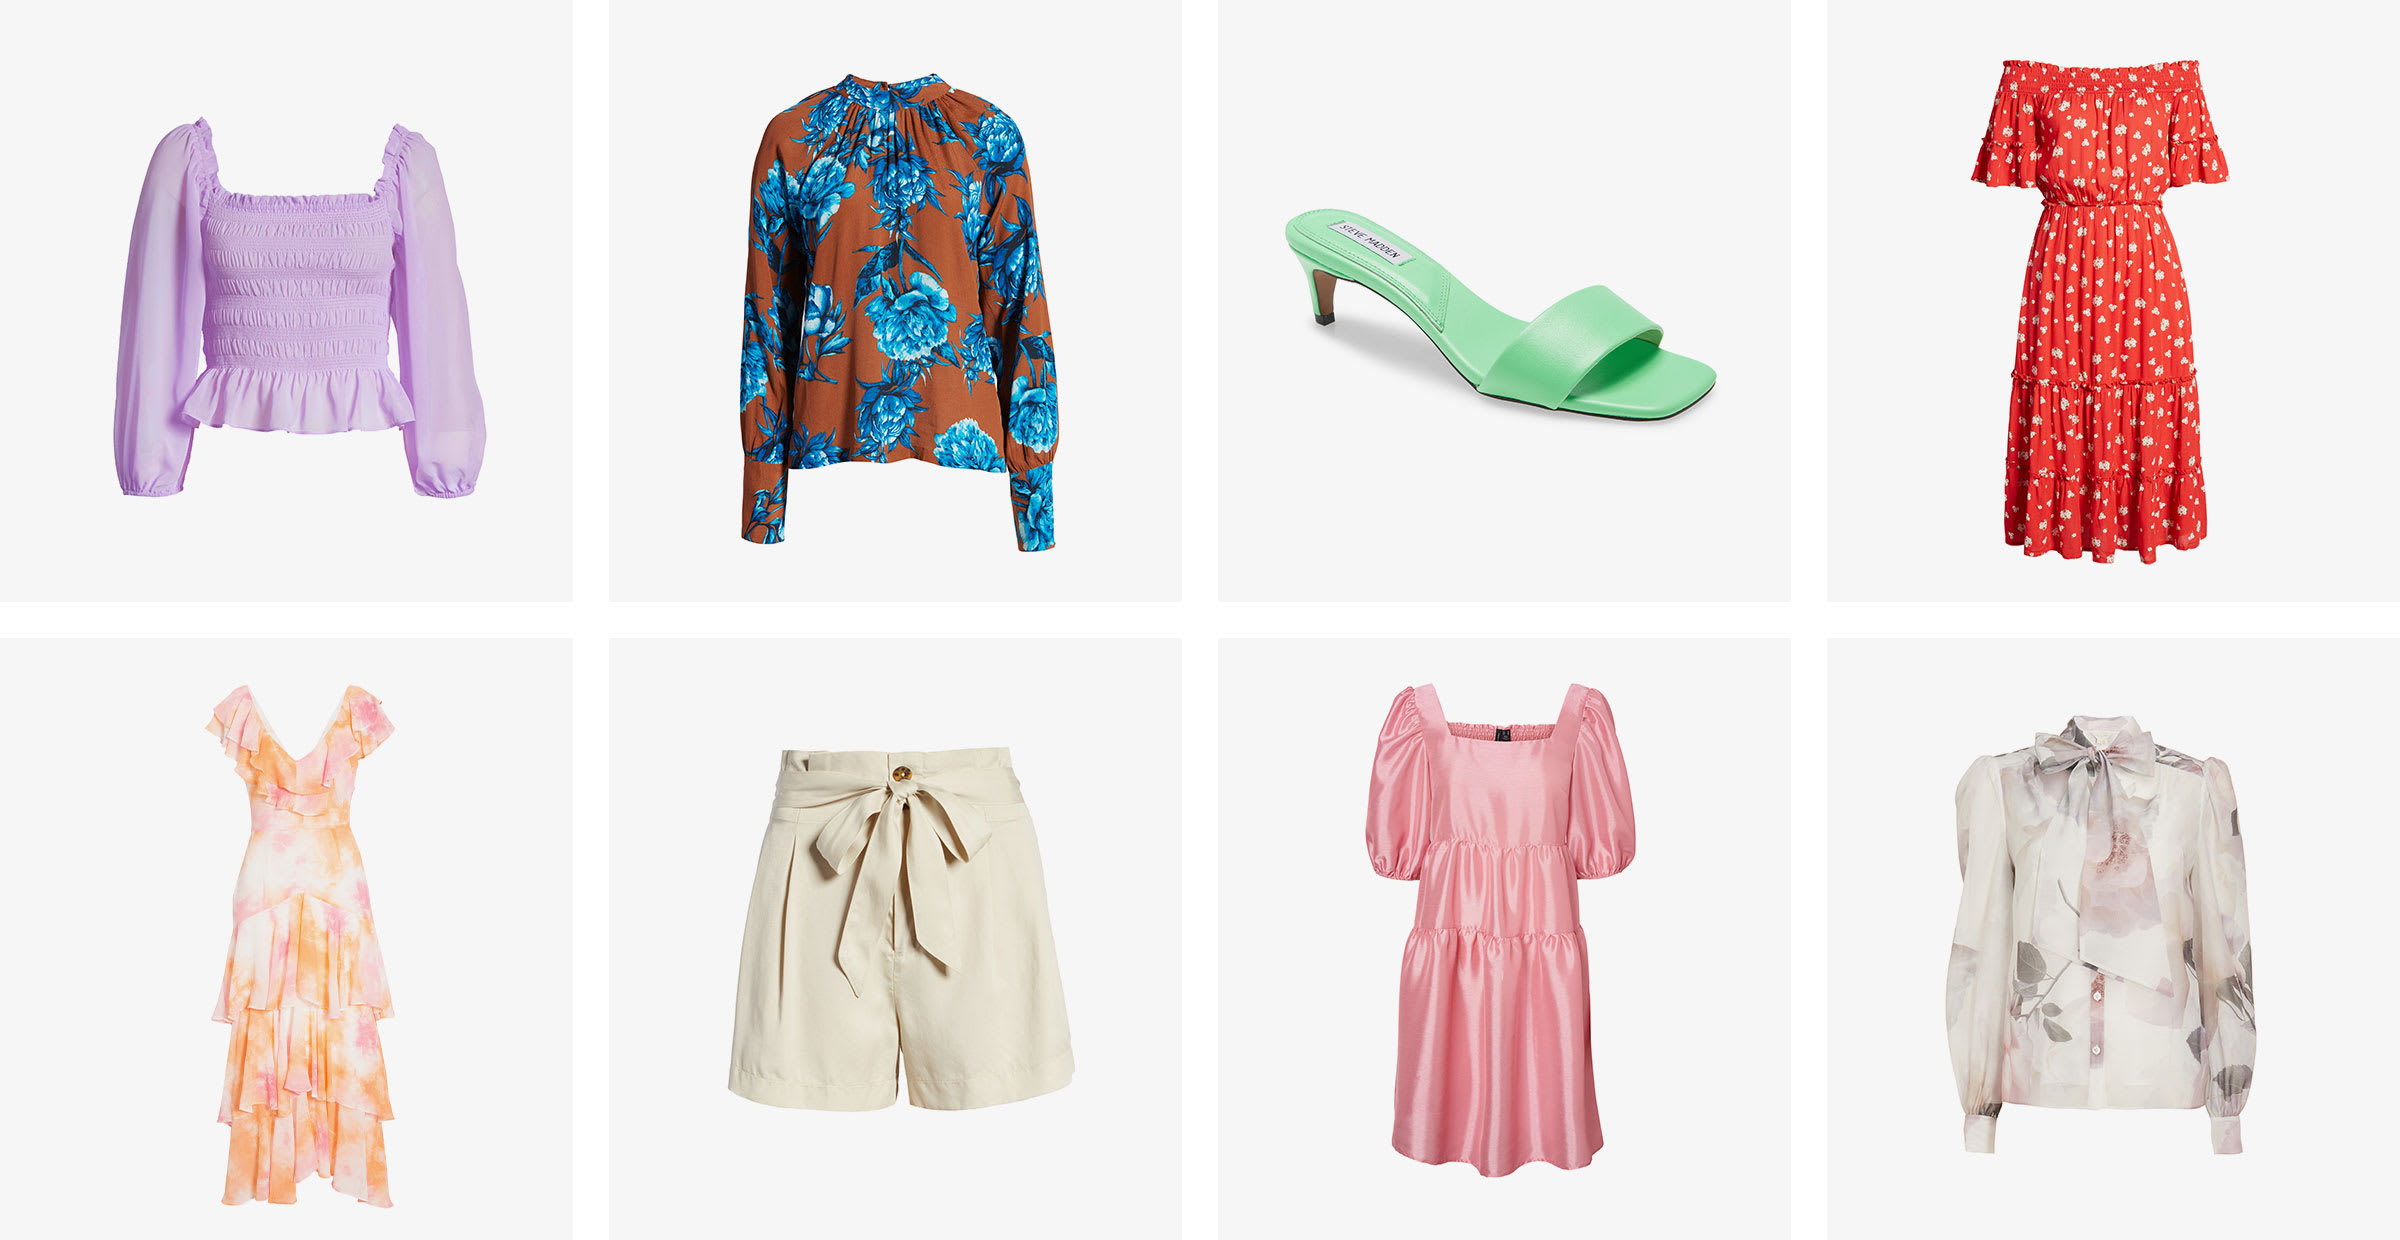 Romantic style: Women's clothing options